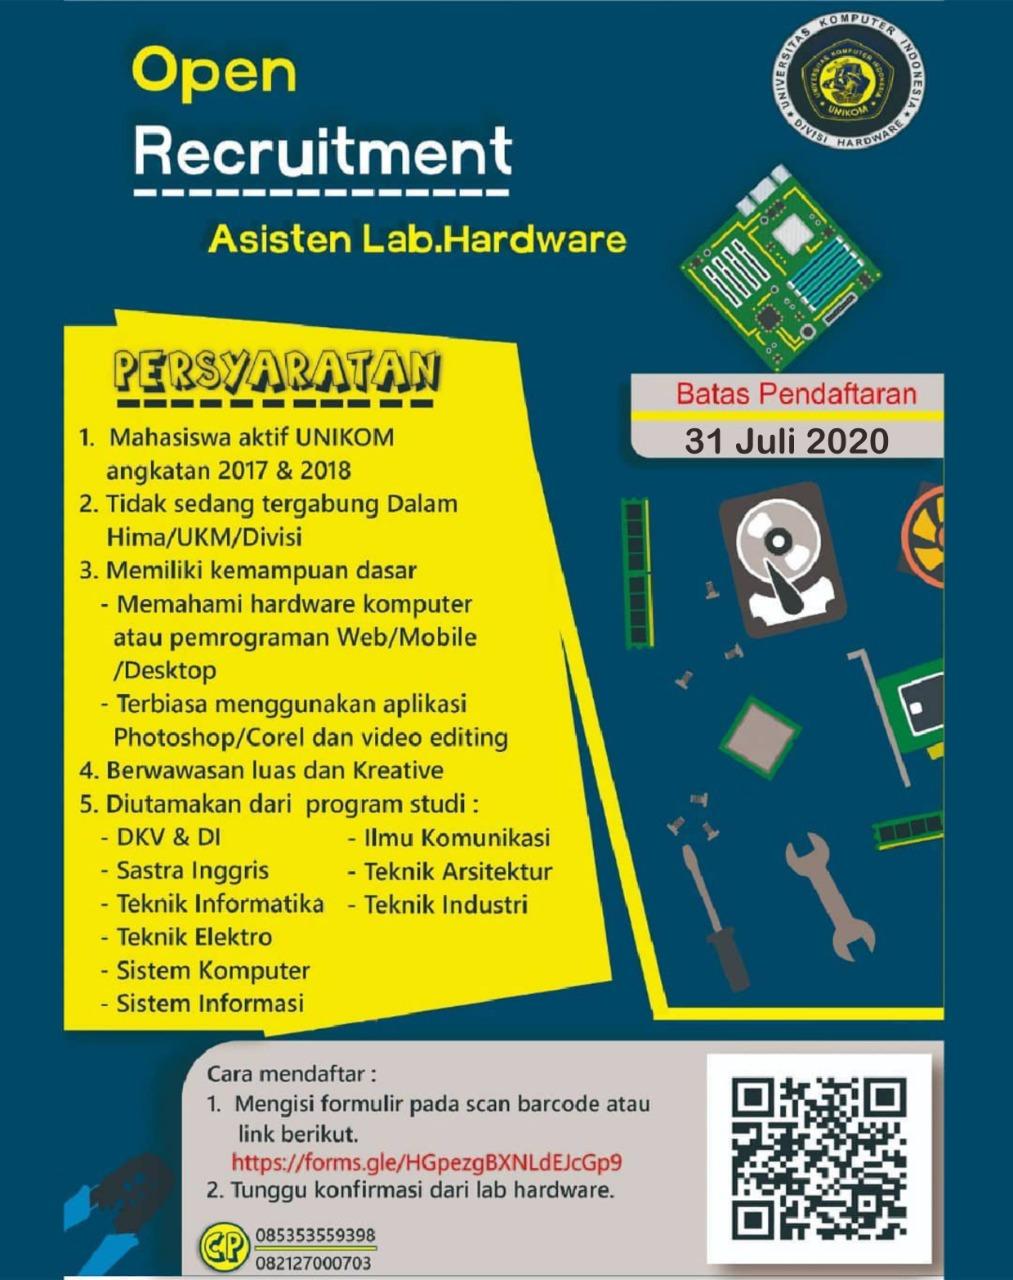 Recruitment Asisten Lab. Hardware Universitas Komputer Indonesia